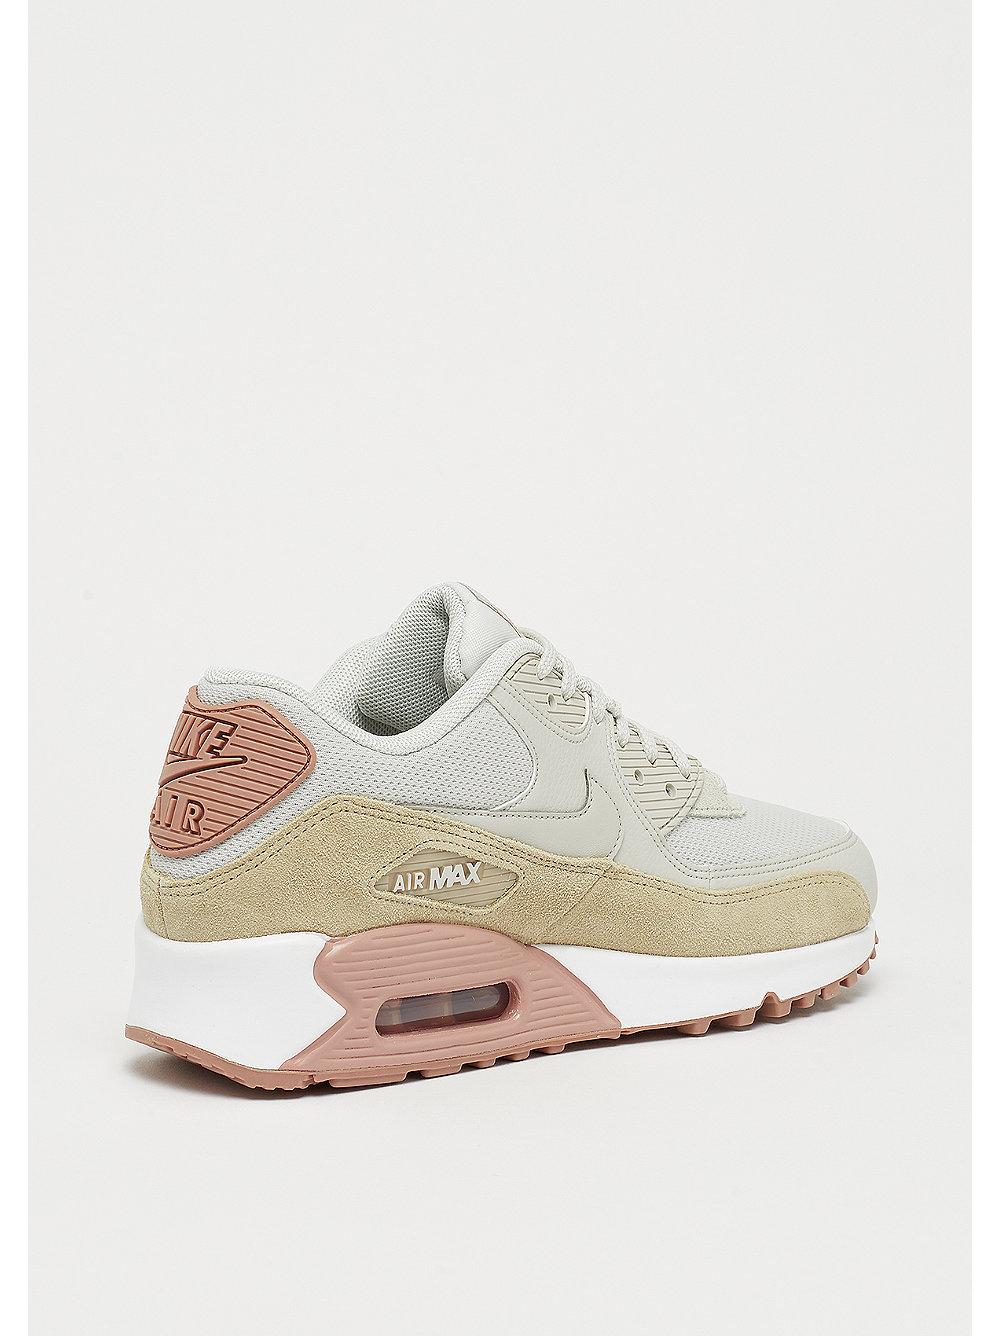 Nike Wmns Air Max 90 Damen 36 Khaki LO87JJEe